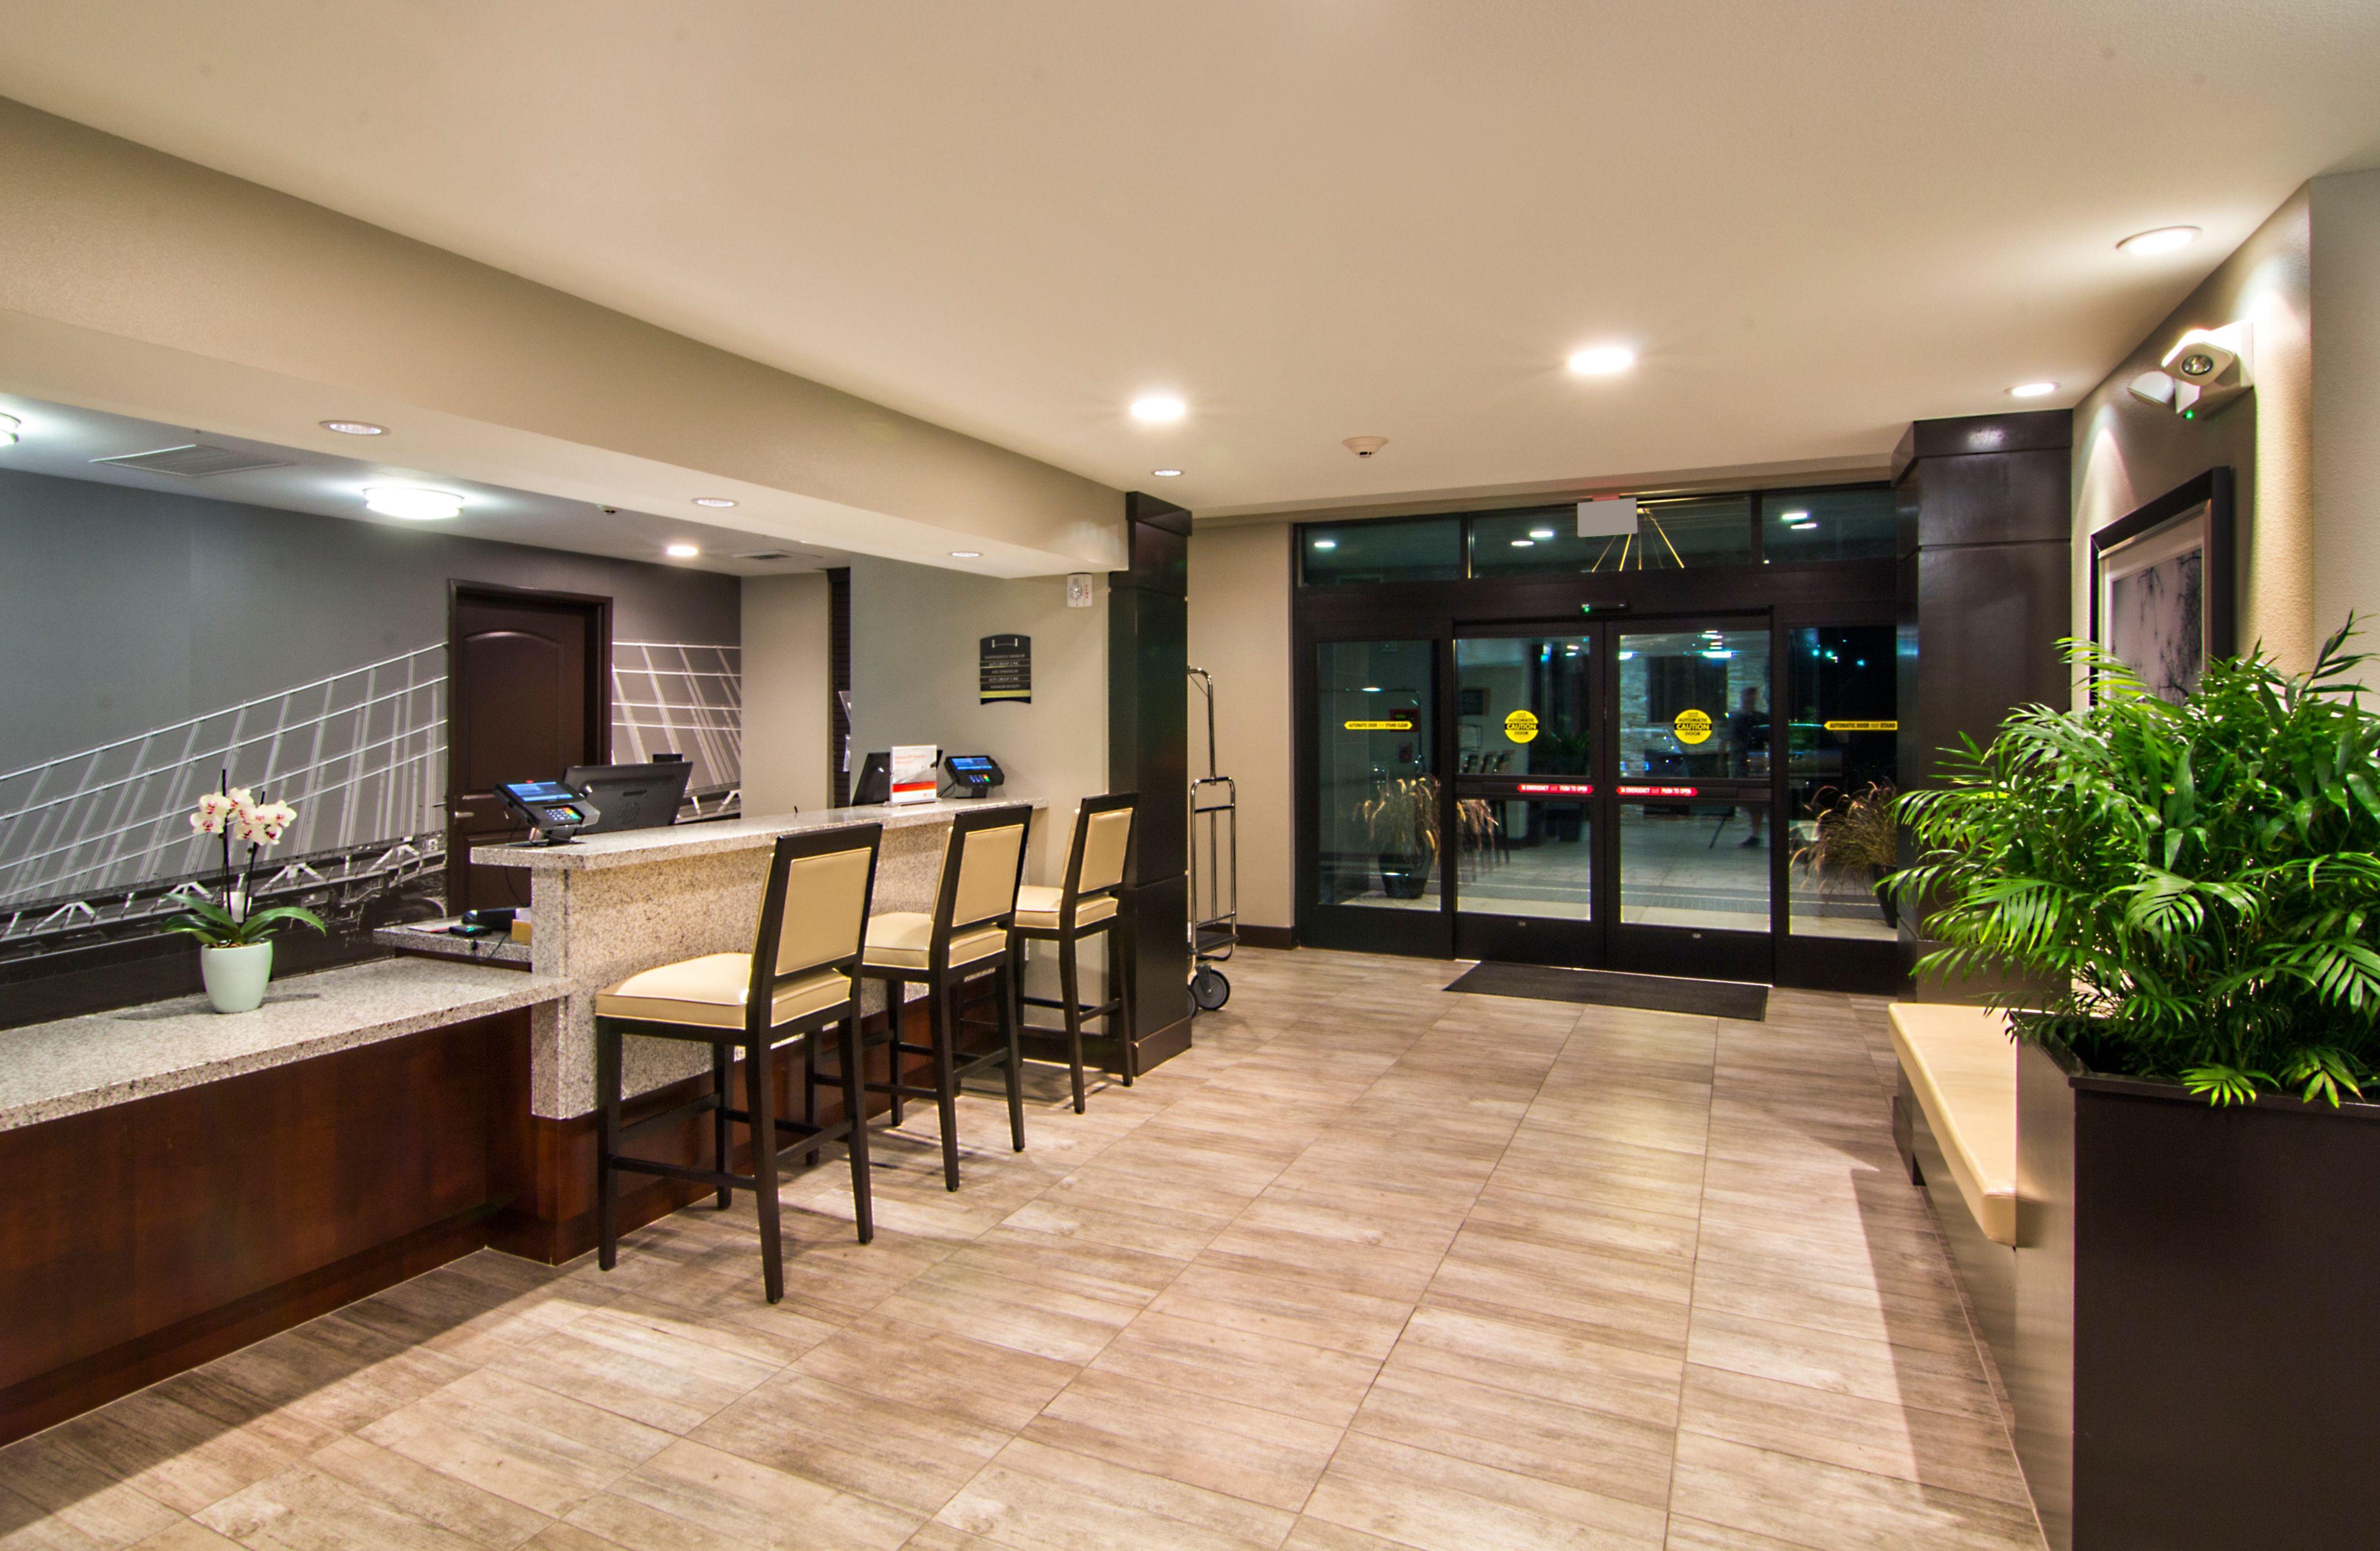 Staybridge Suites Carlsbad - San Diego image 6